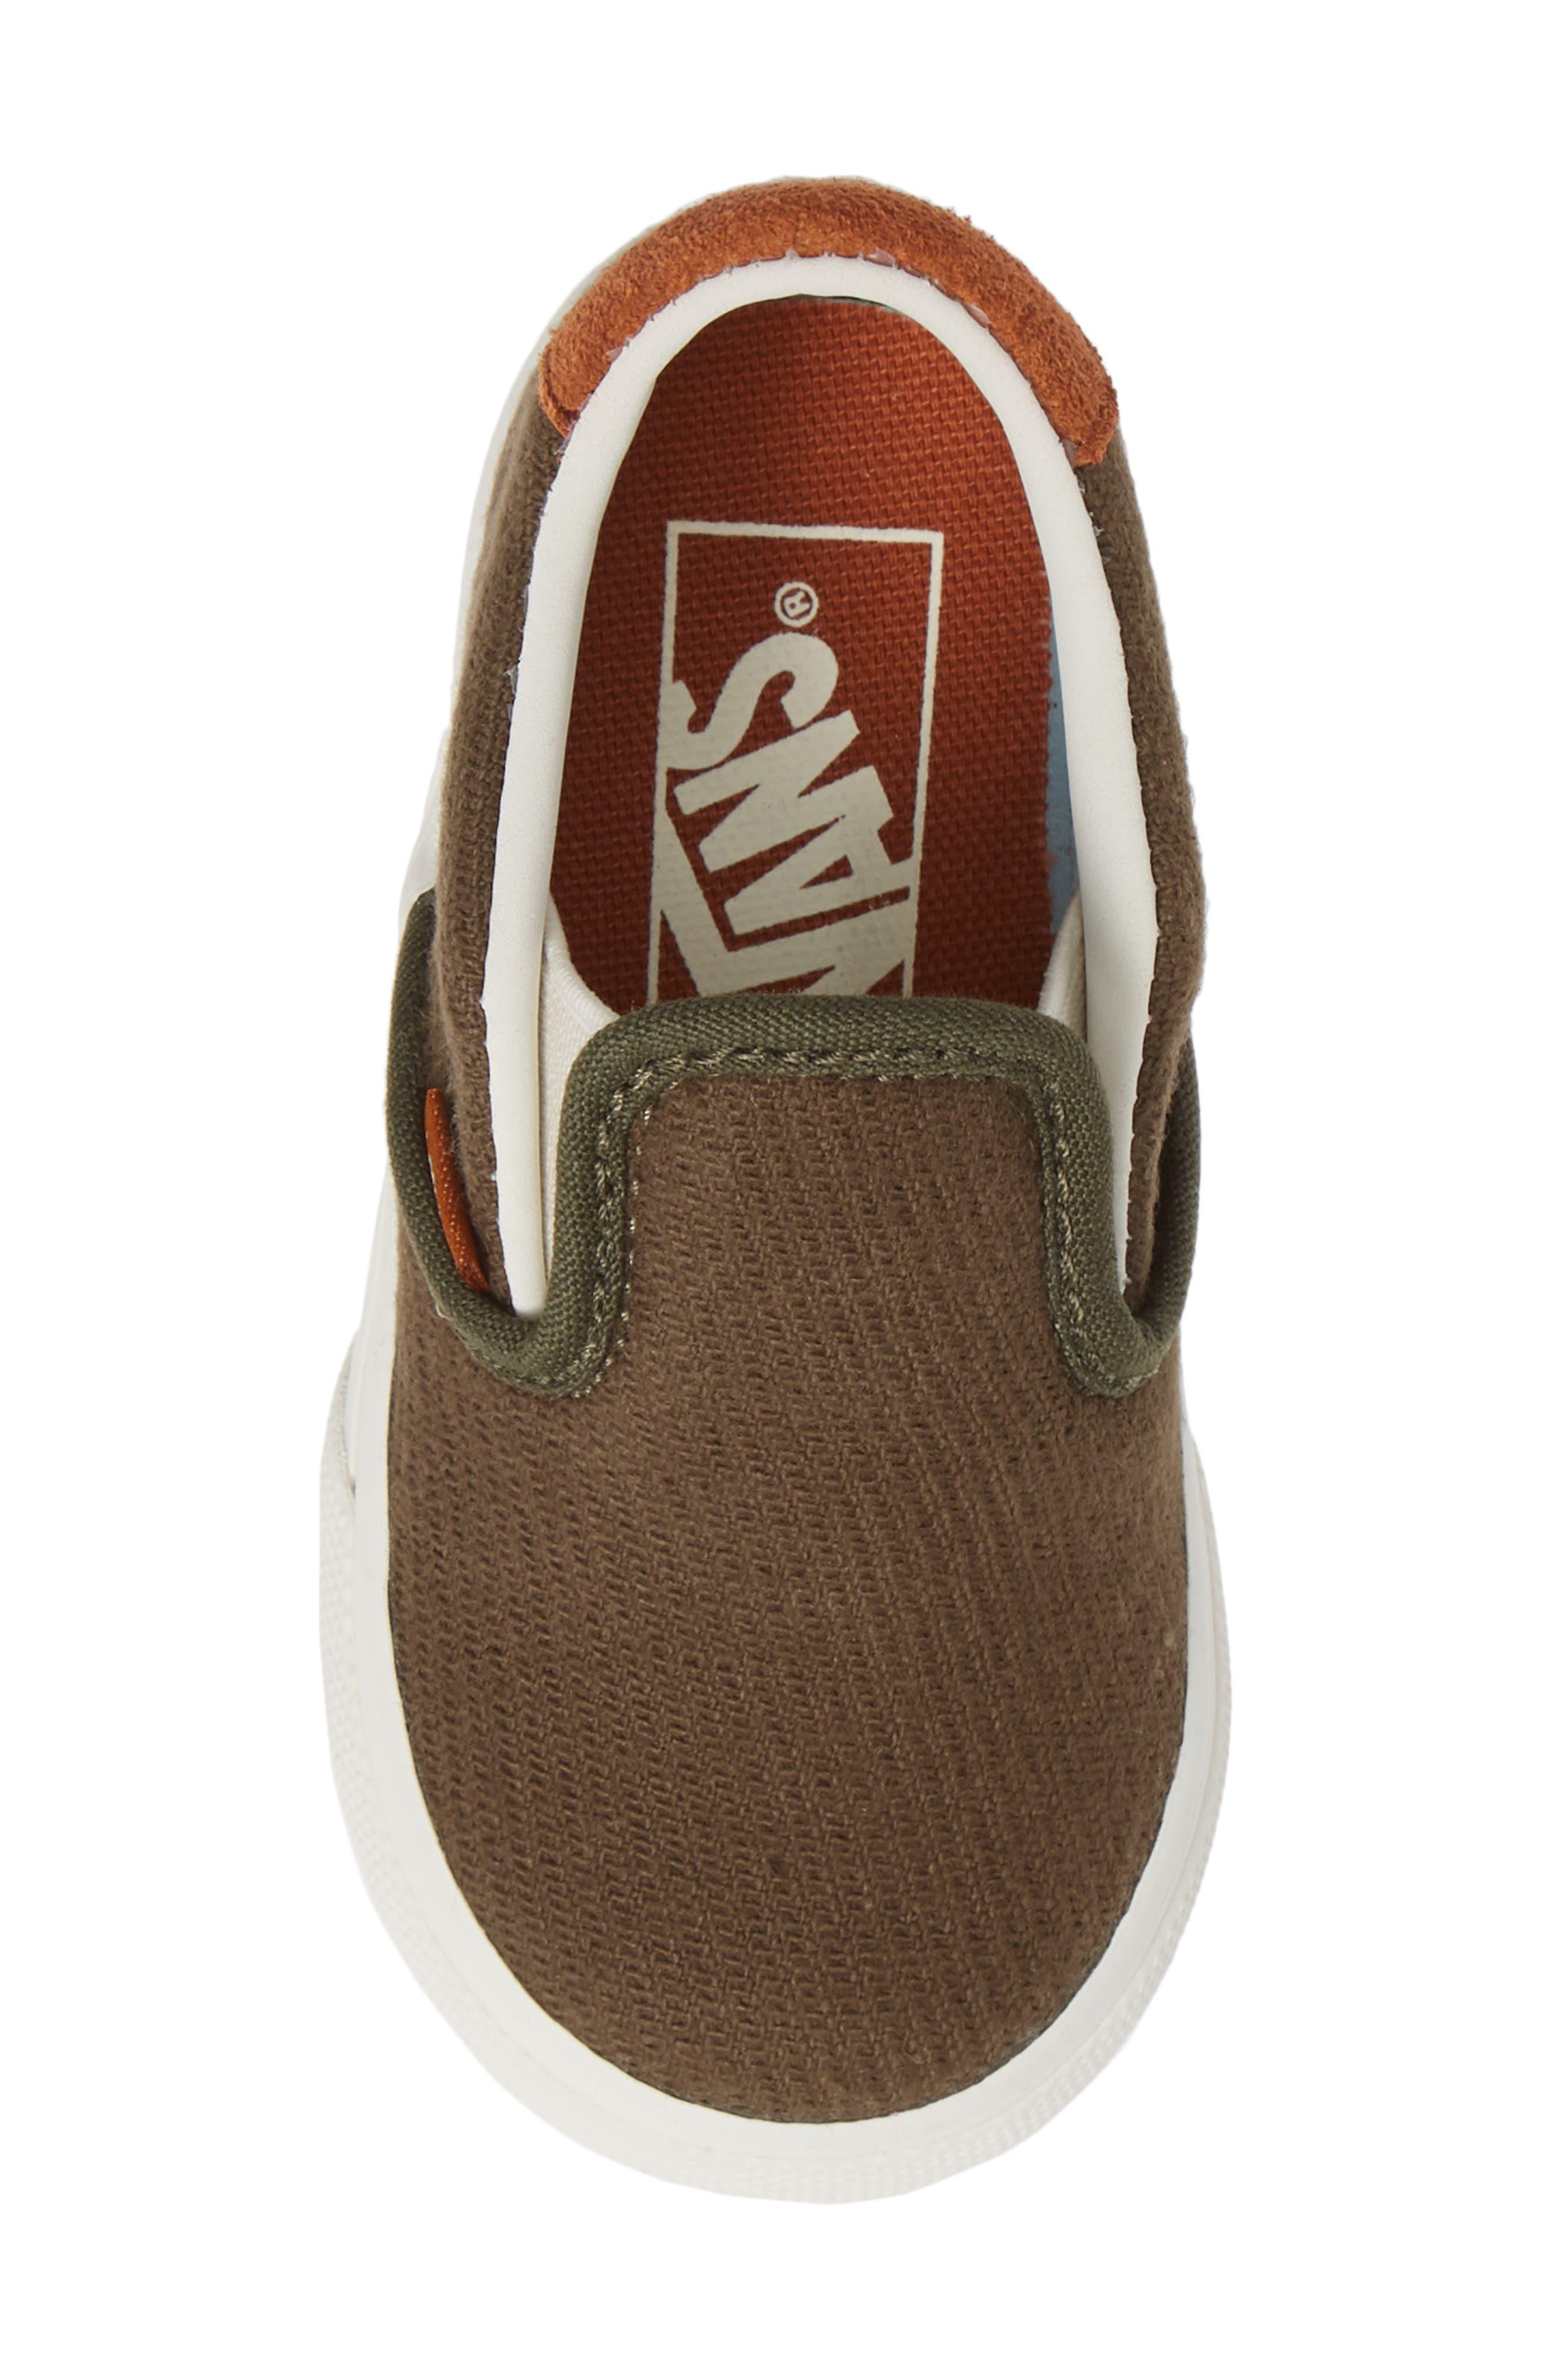 59 Slip-On Sneaker,                             Alternate thumbnail 5, color,                             FLANNEL DUSTY OLIVE